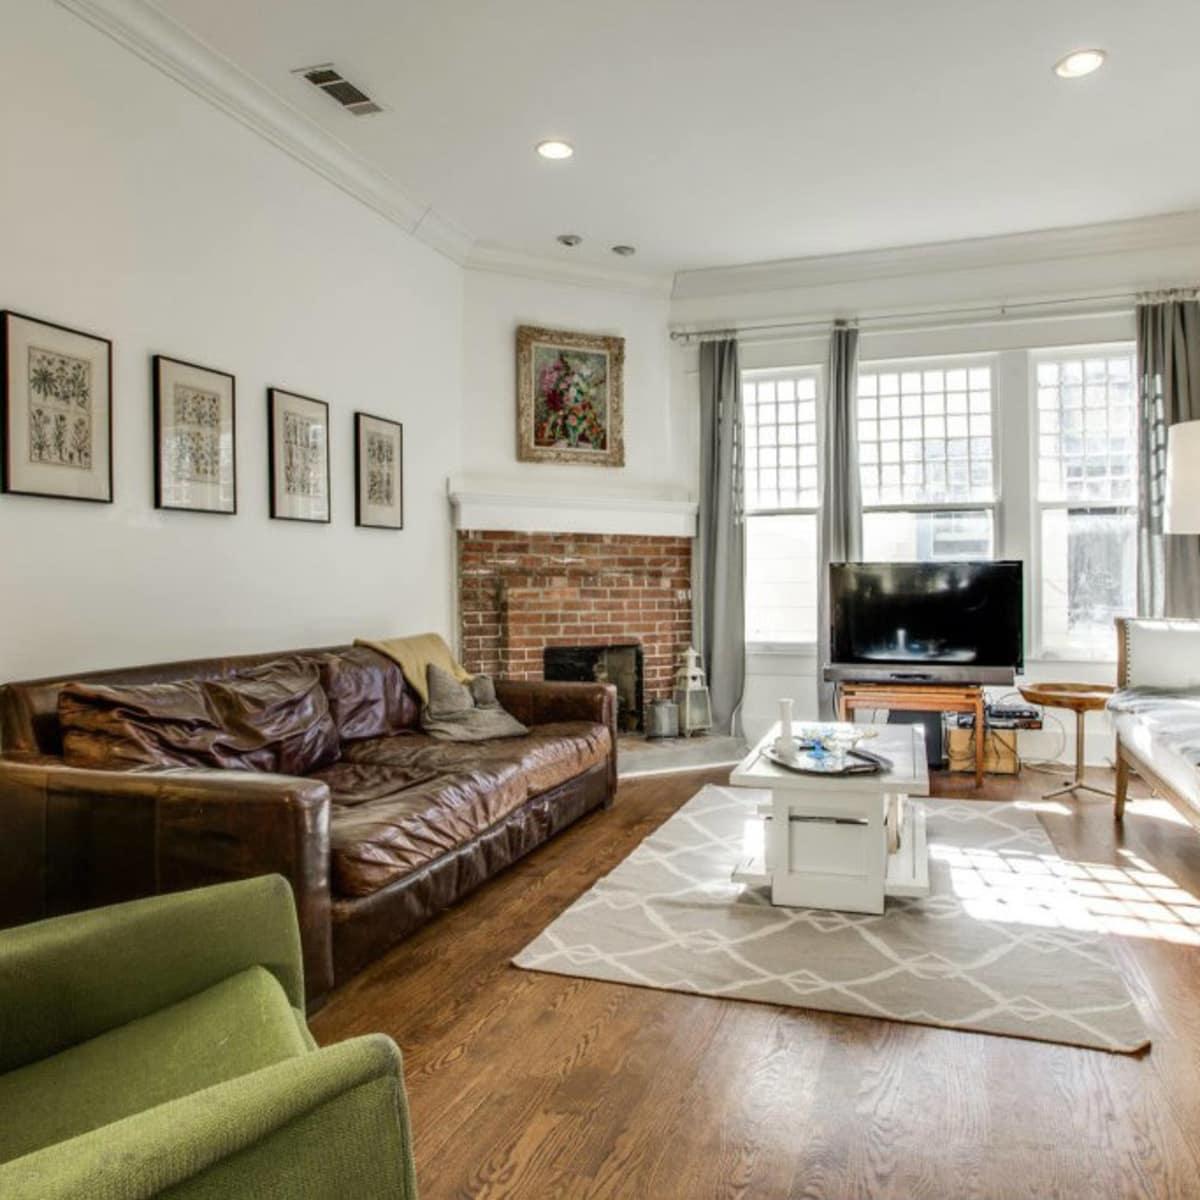 118 N. Winnetka living room